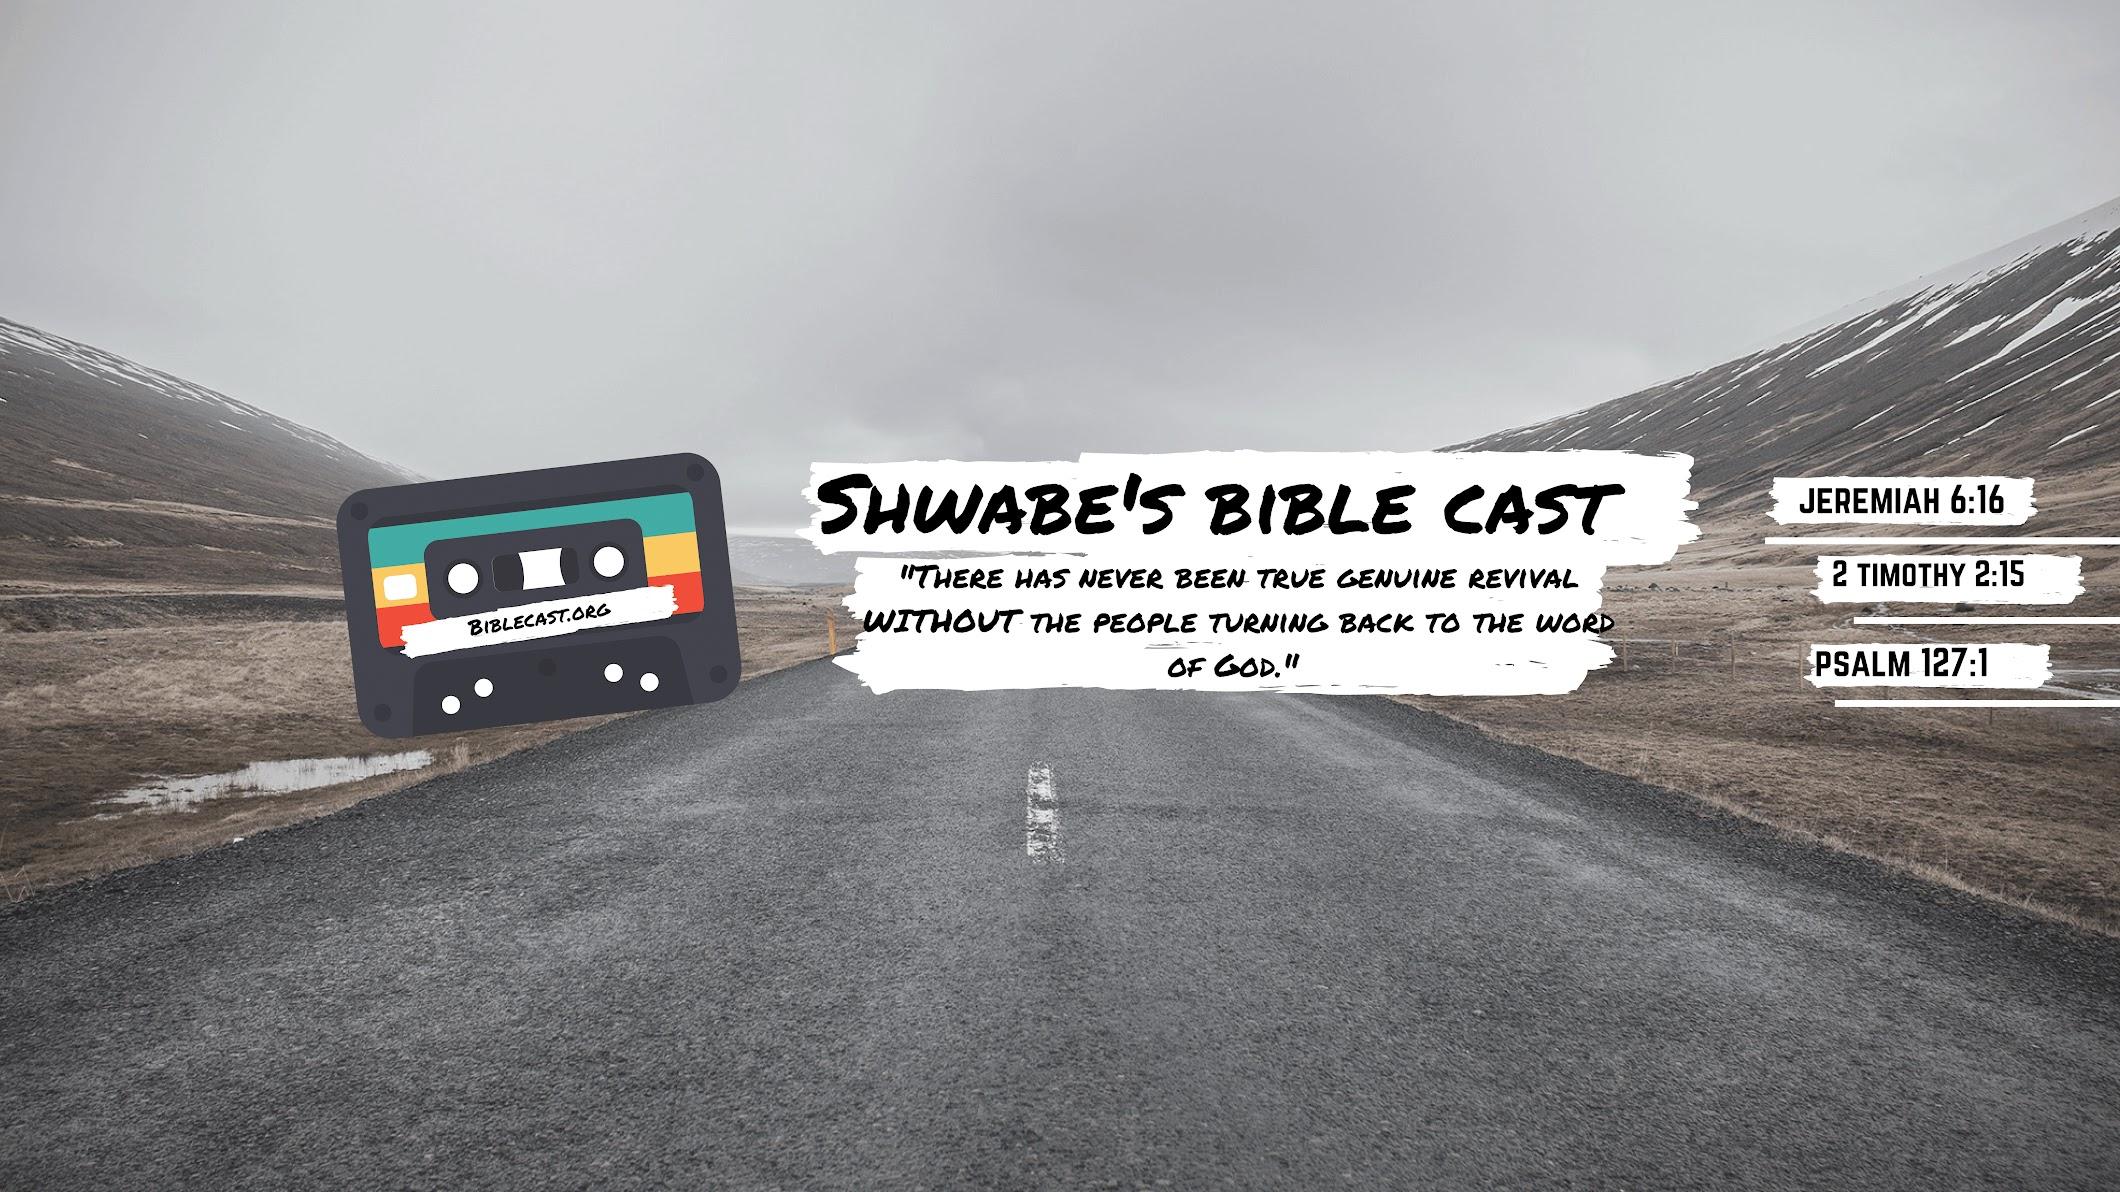 Shwabe's Bible Cast